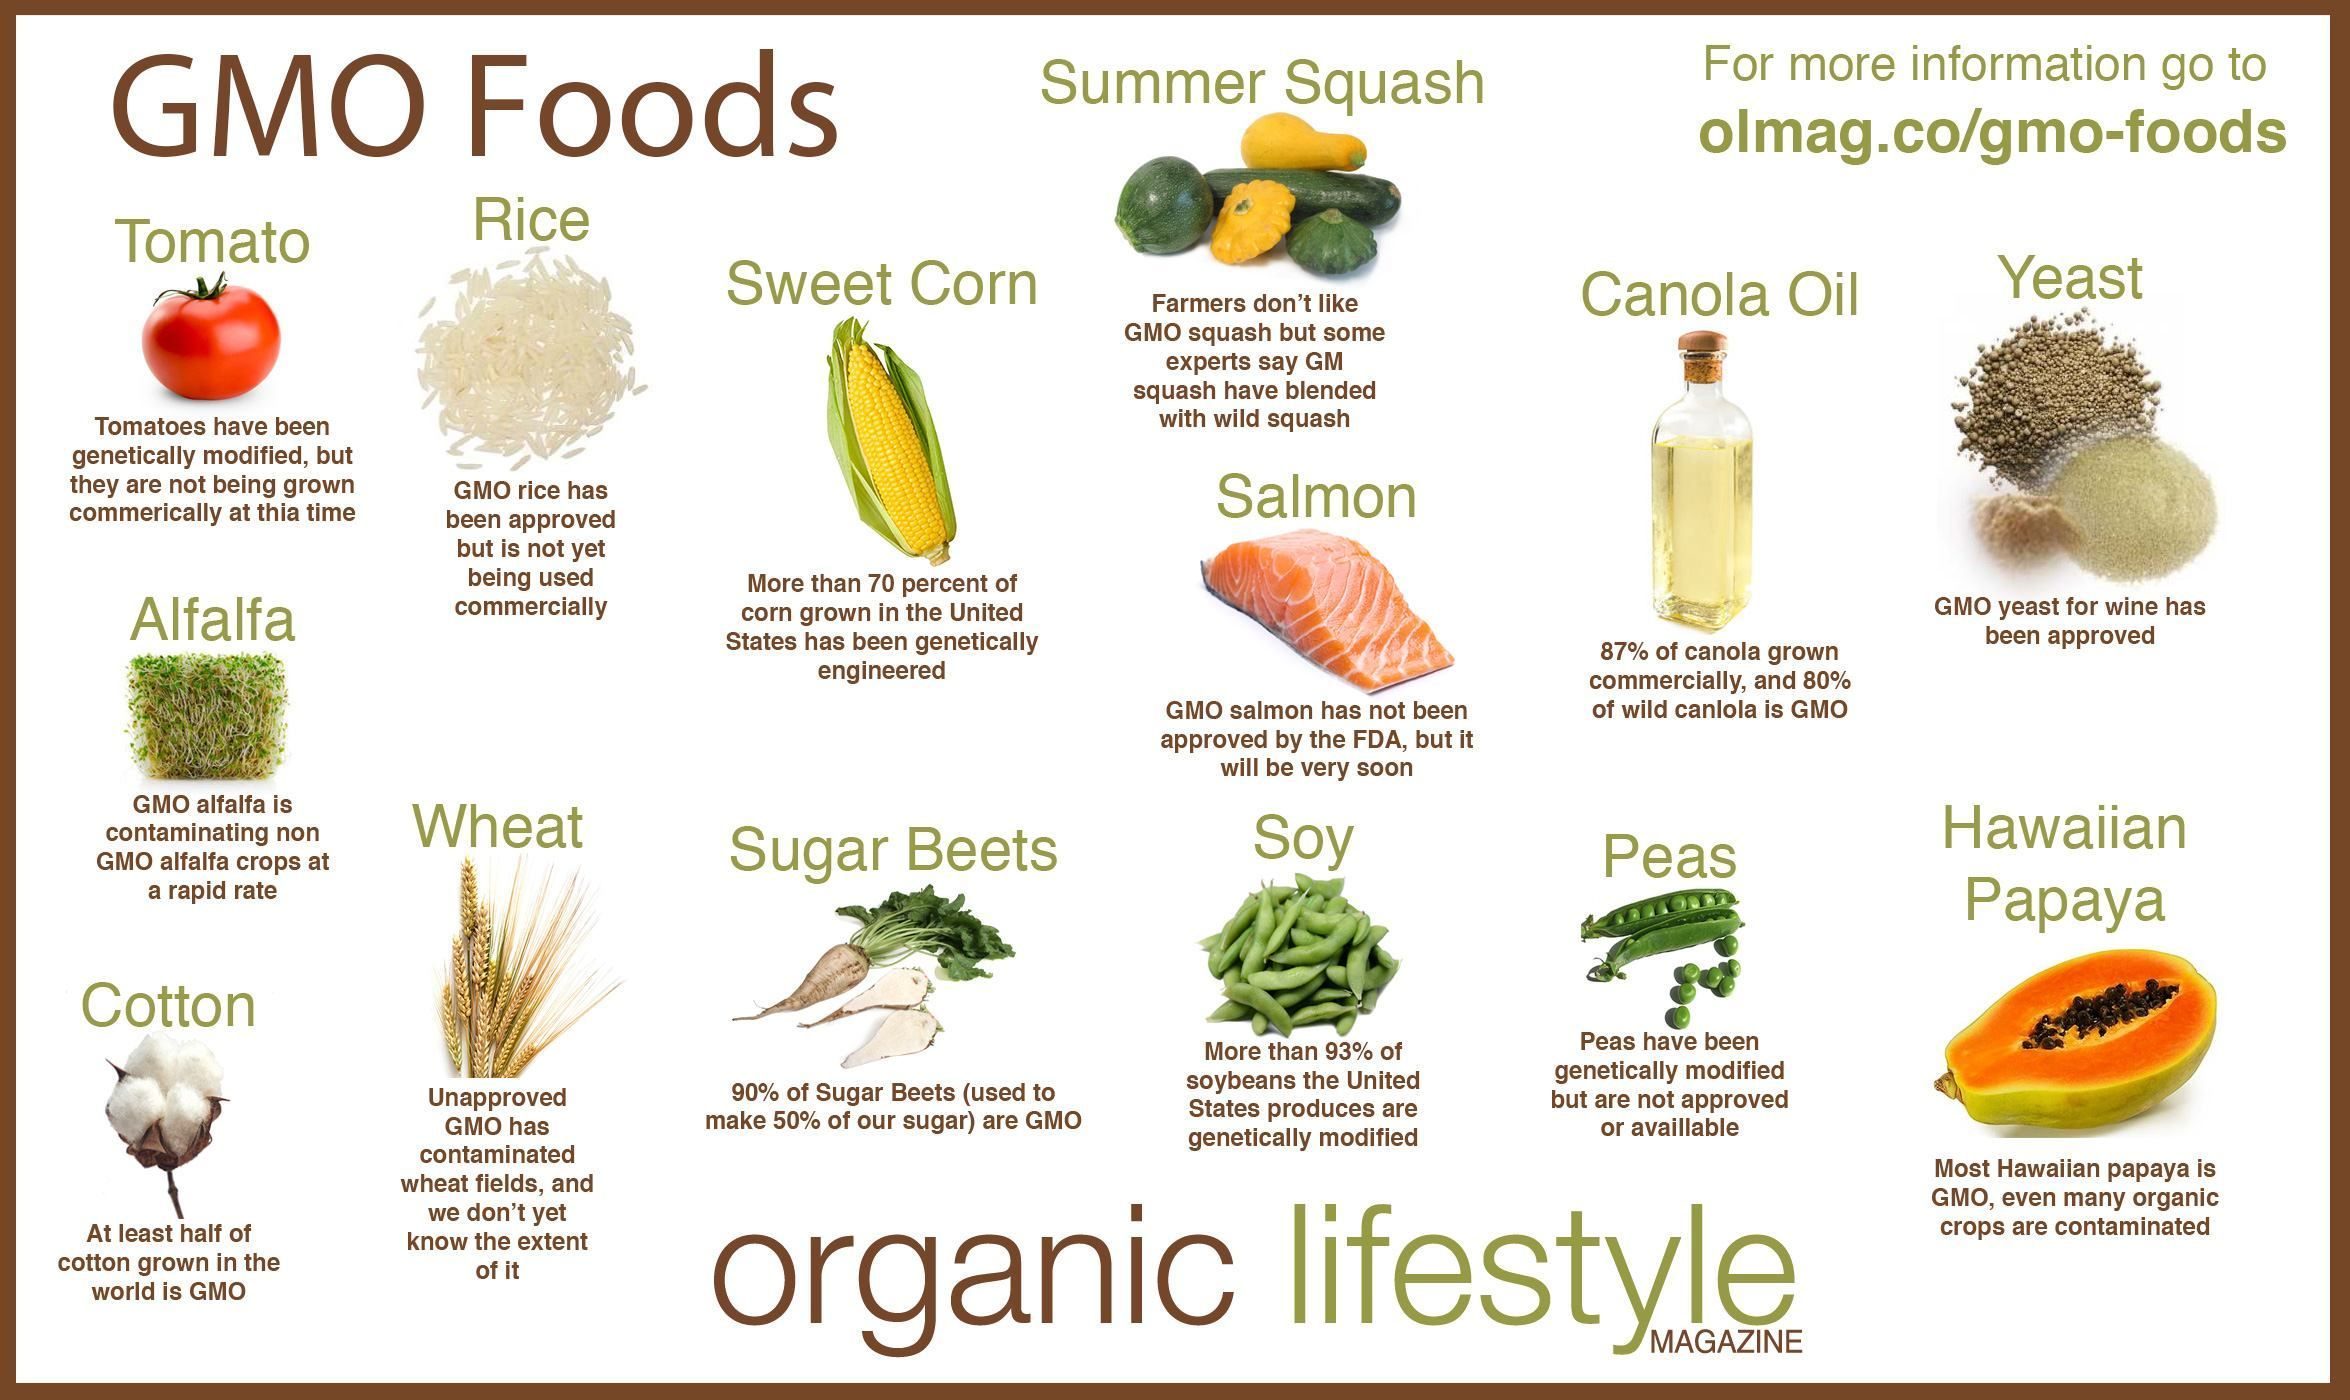 gmo-Foods-Infographic.jpg